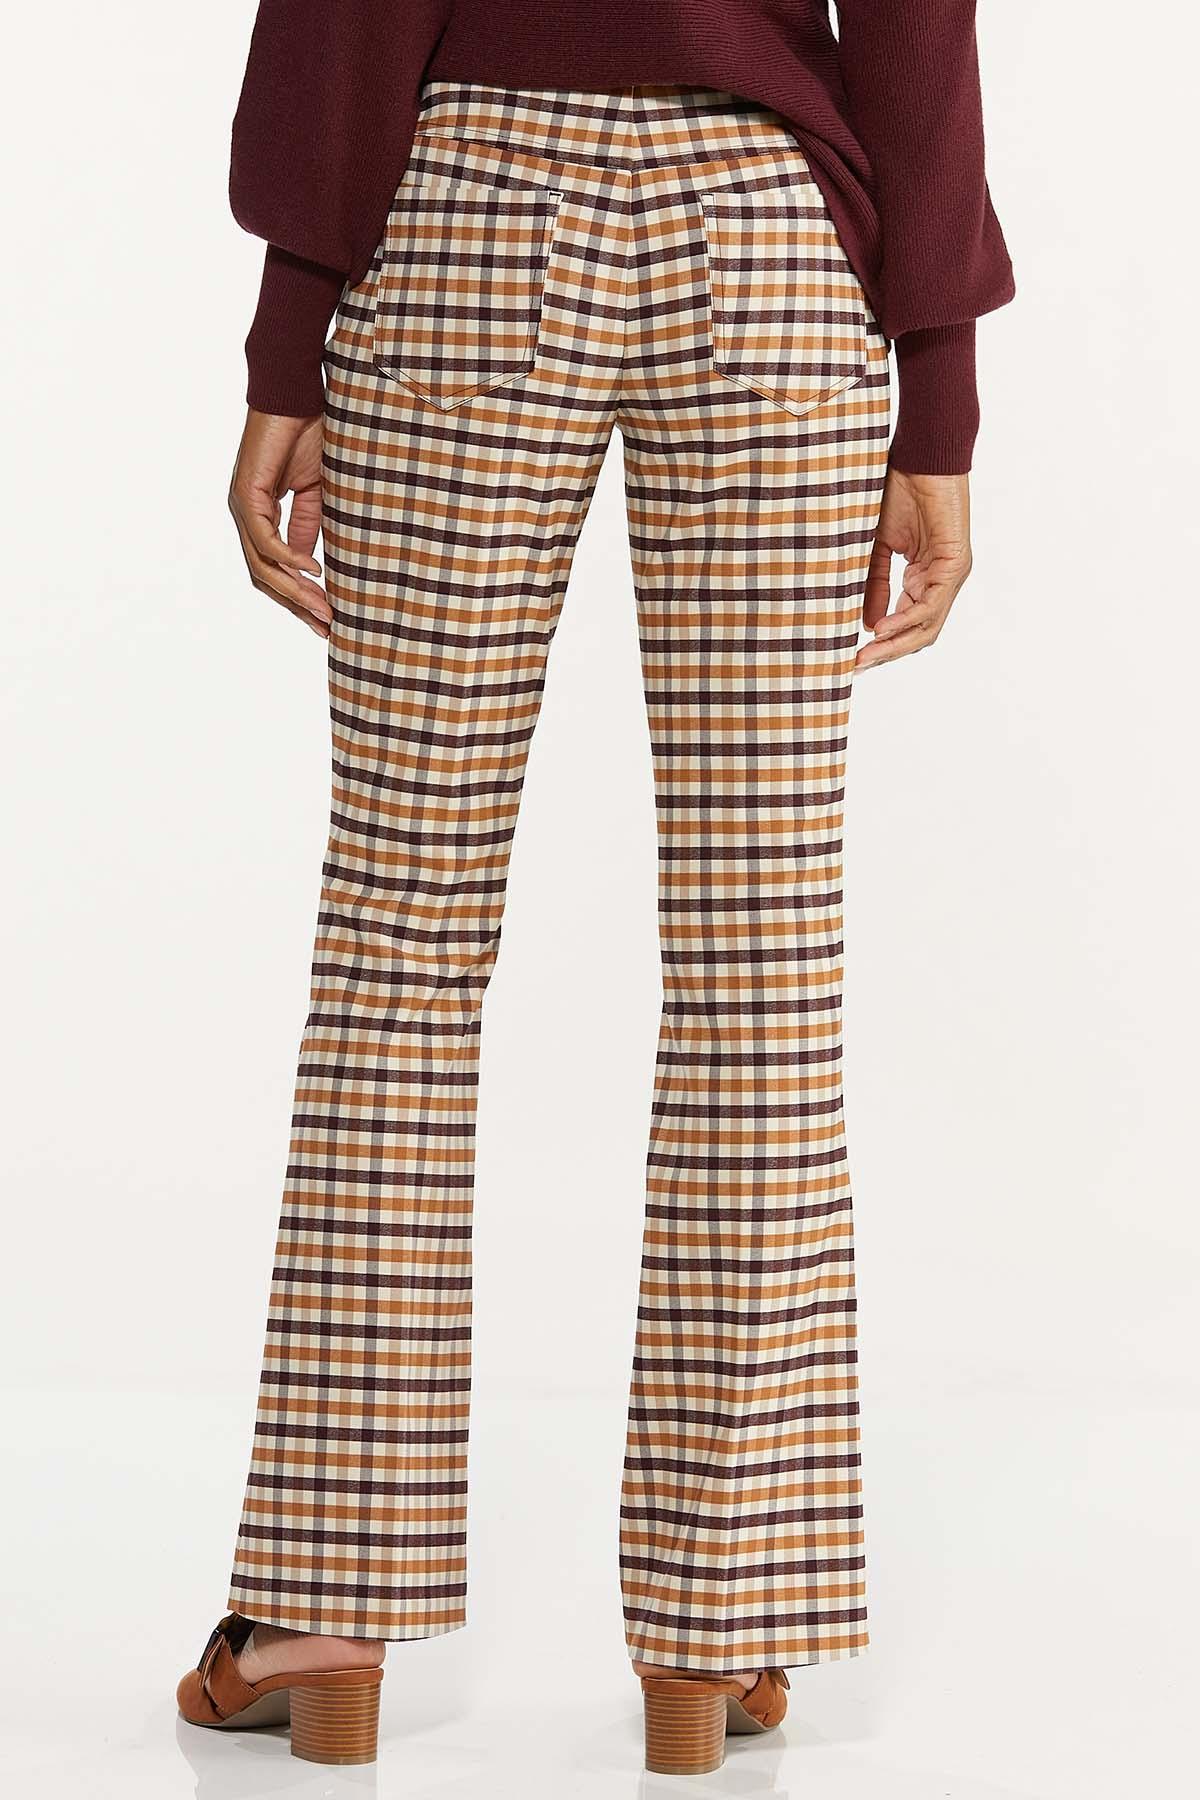 Petite Plaid Bengaline Pants (Item #44641414)